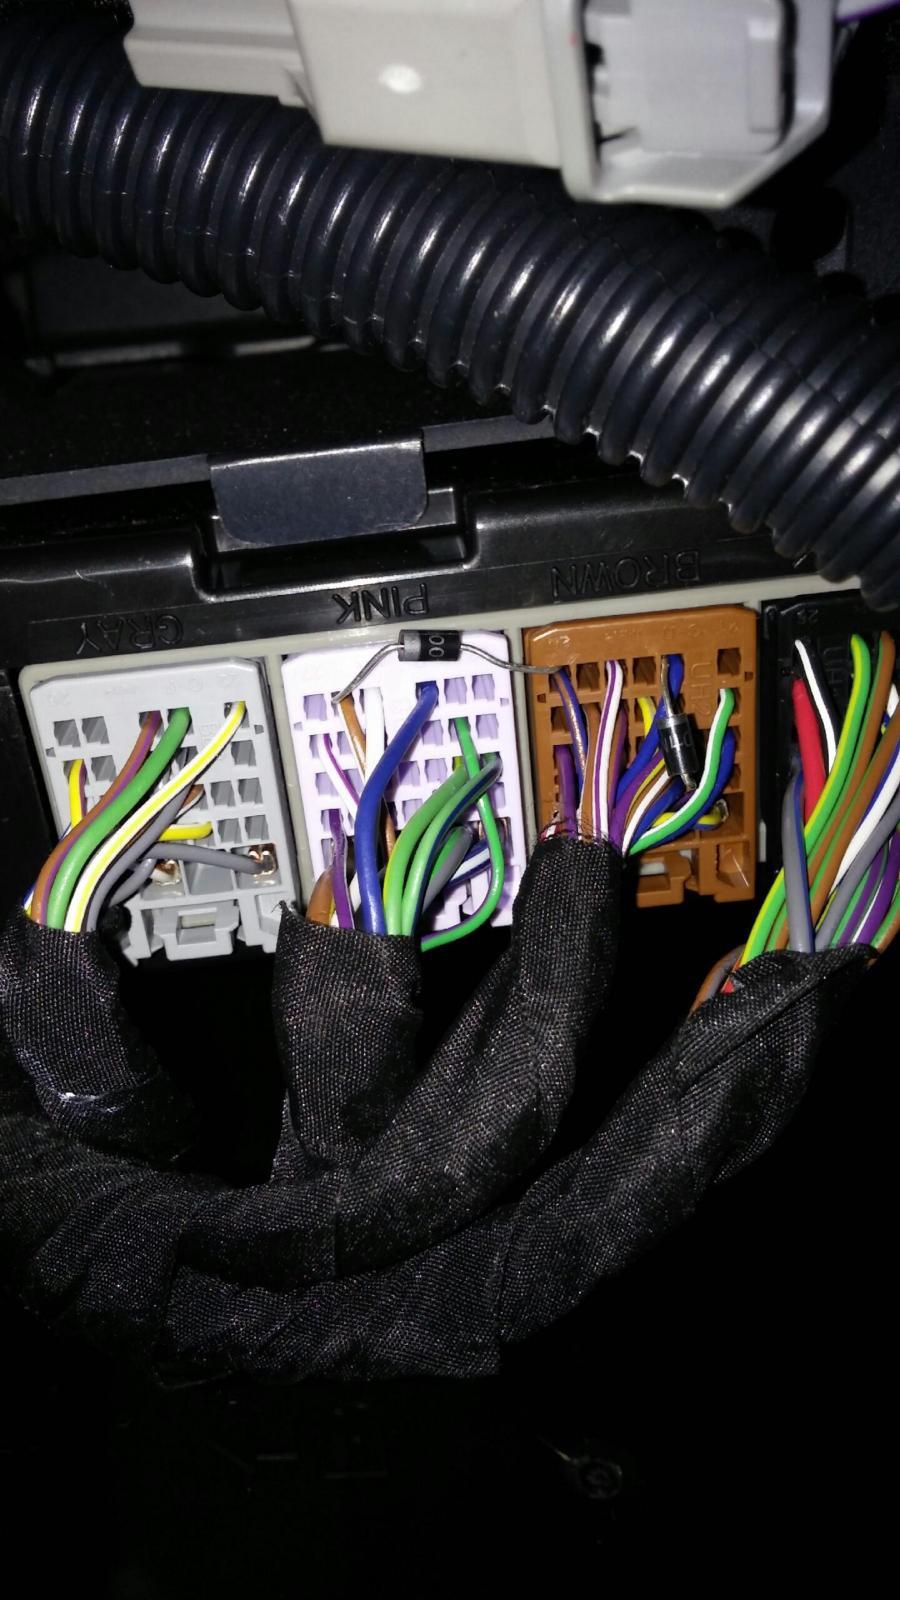 Dome Light Wire 2014 2018 Silverado Sierra Mods Footwell Wiring Diagram 1999 Gmc 72b7b10e2a6f07c17fbbfa6d07c476ed